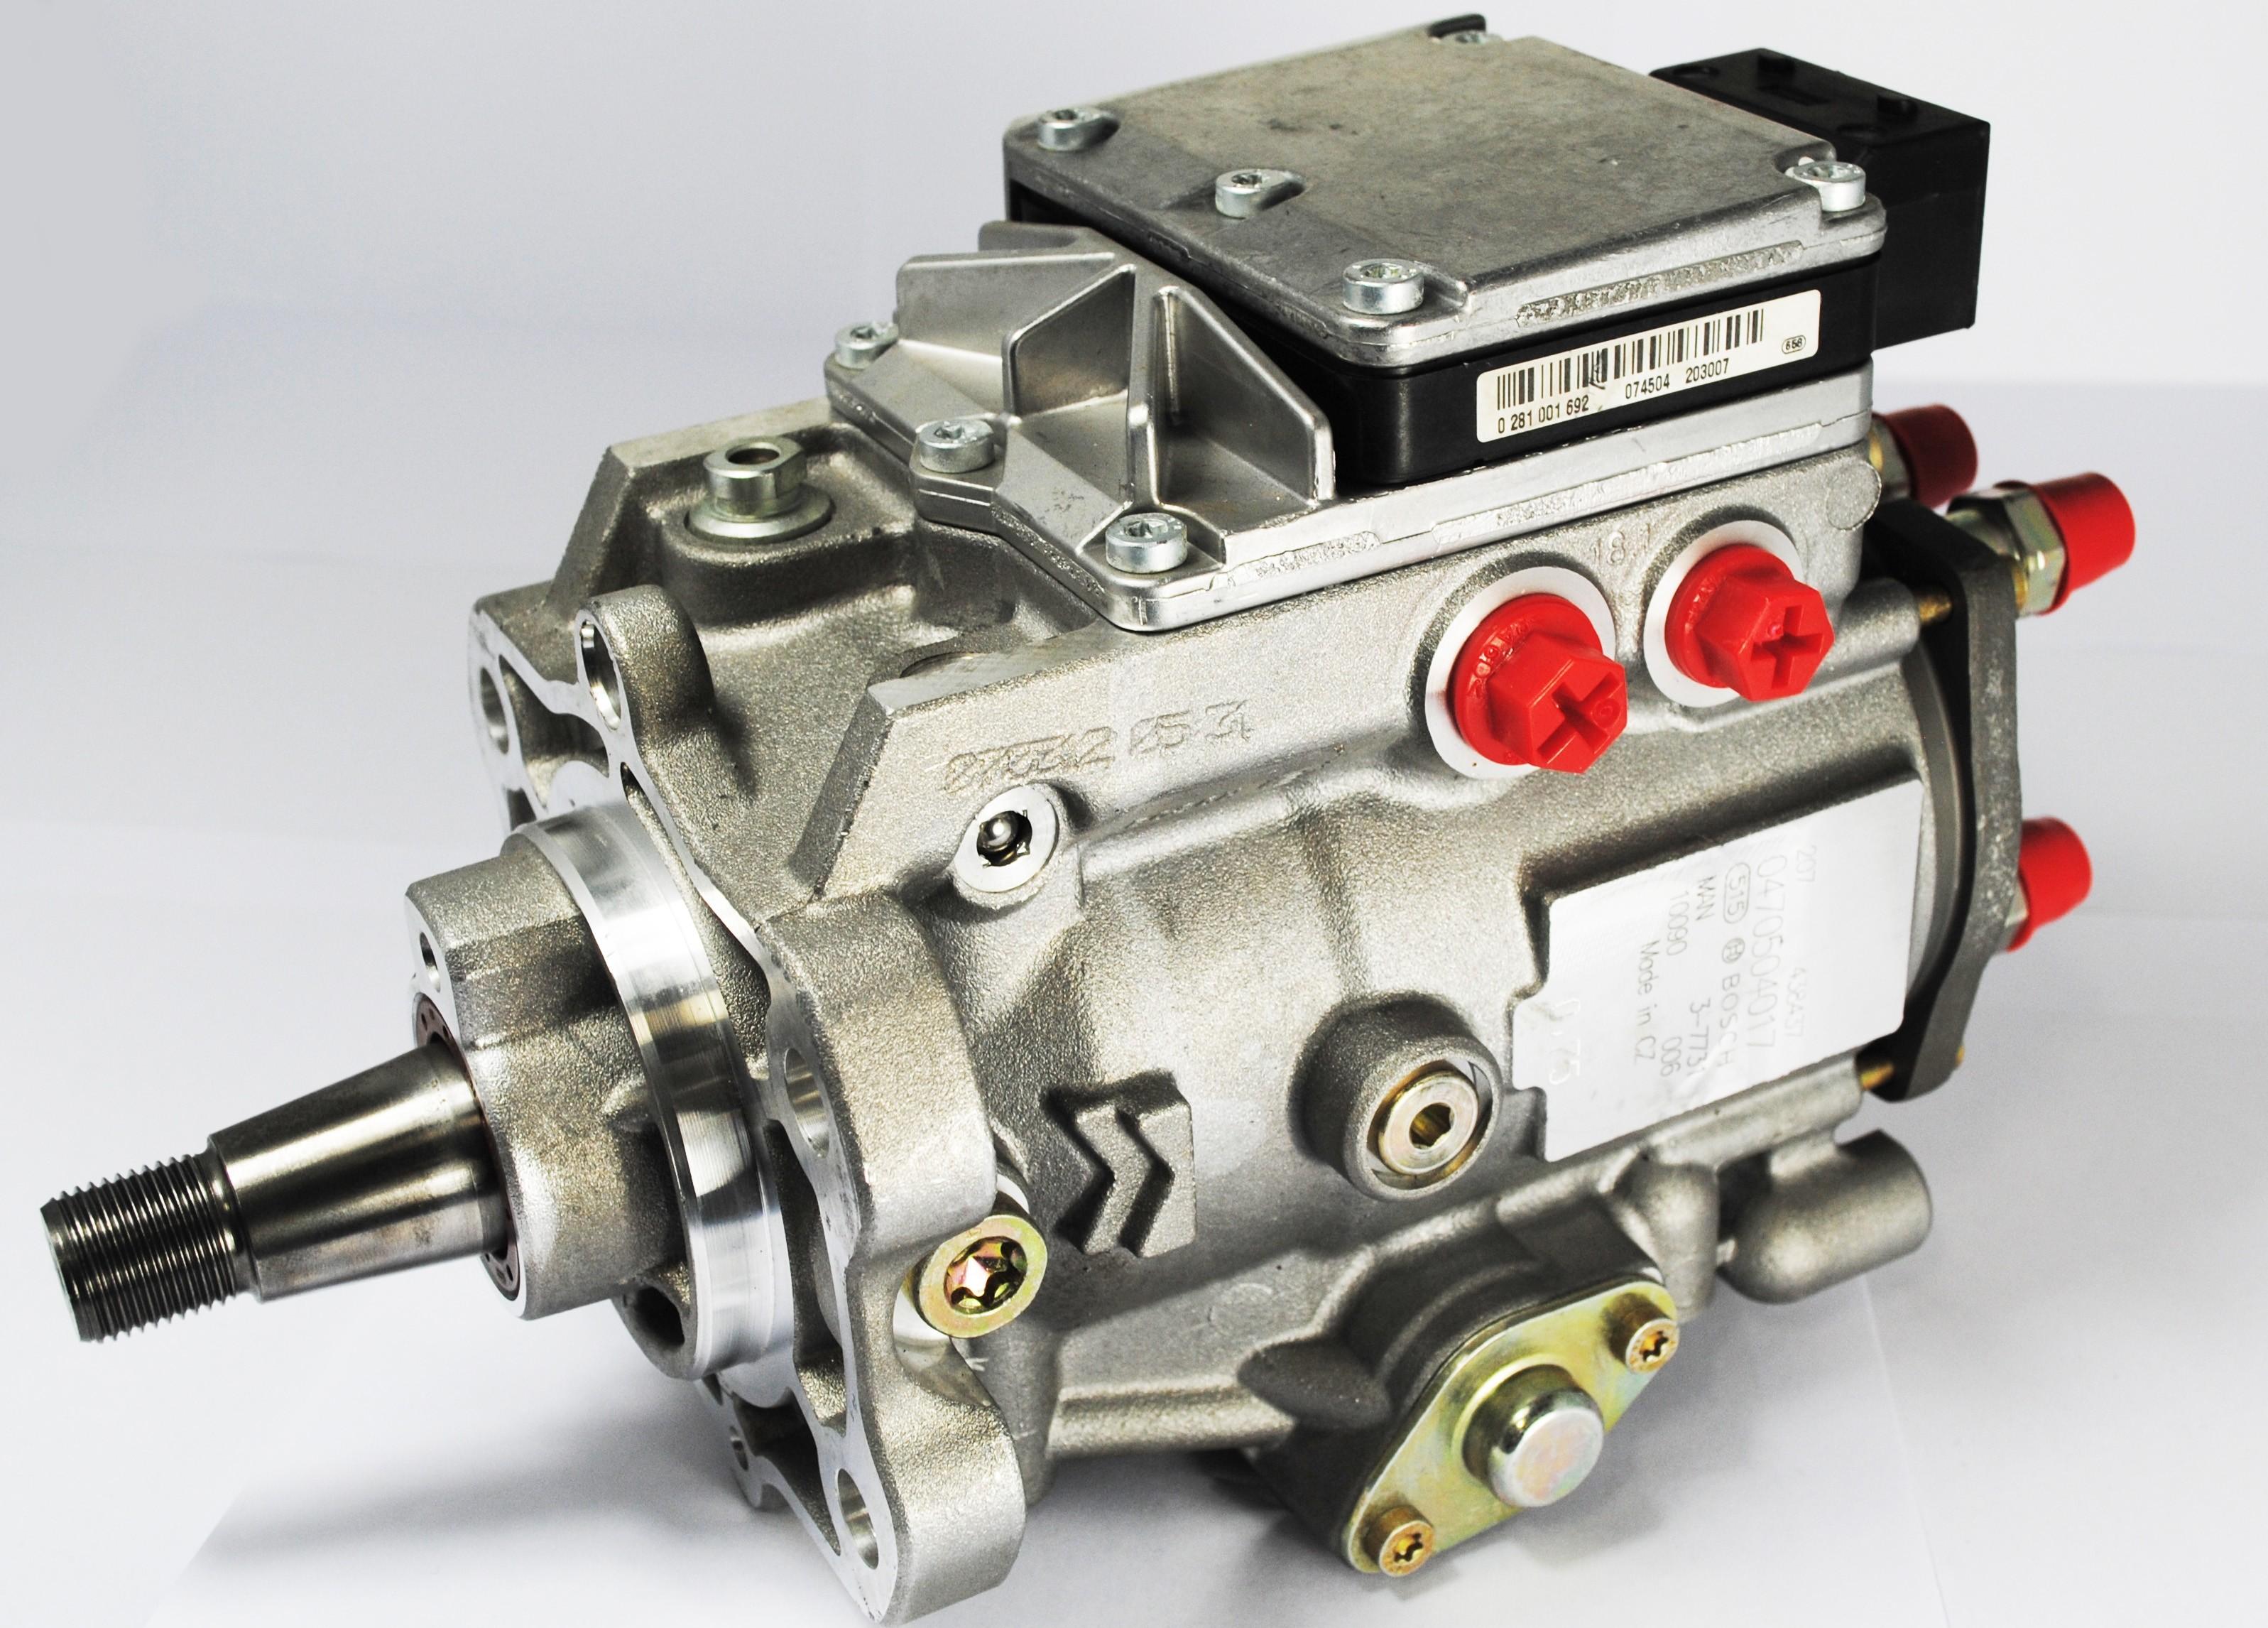 Bosch 0 470 504 028 VP44 Fuel pump